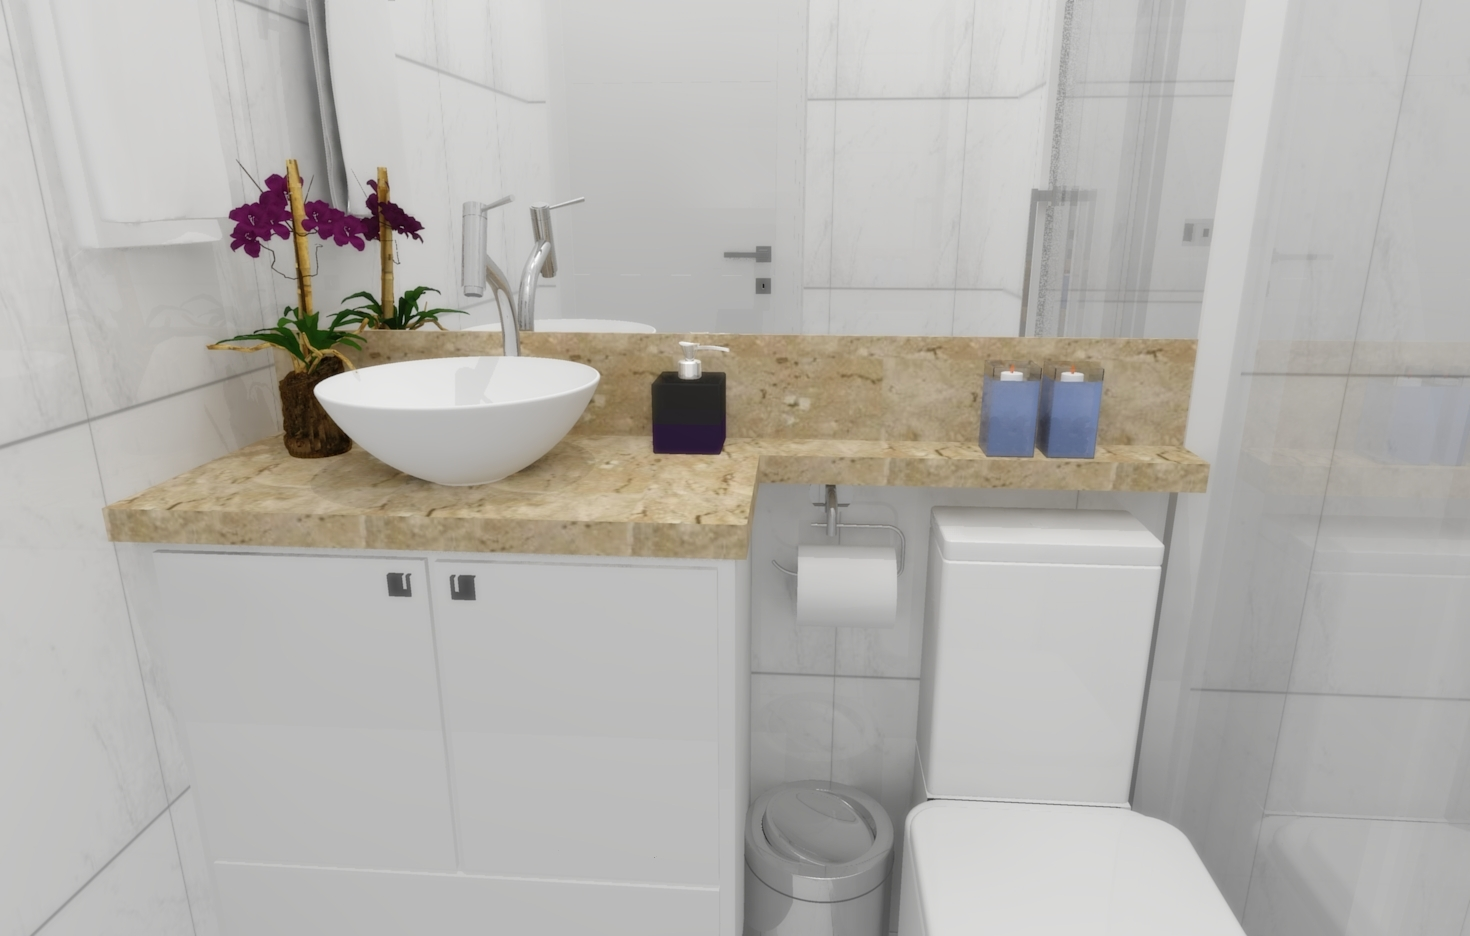 Banheiros e Lavabos  Seu Sonho Desenhado -> Banheiro Pequeno Custo